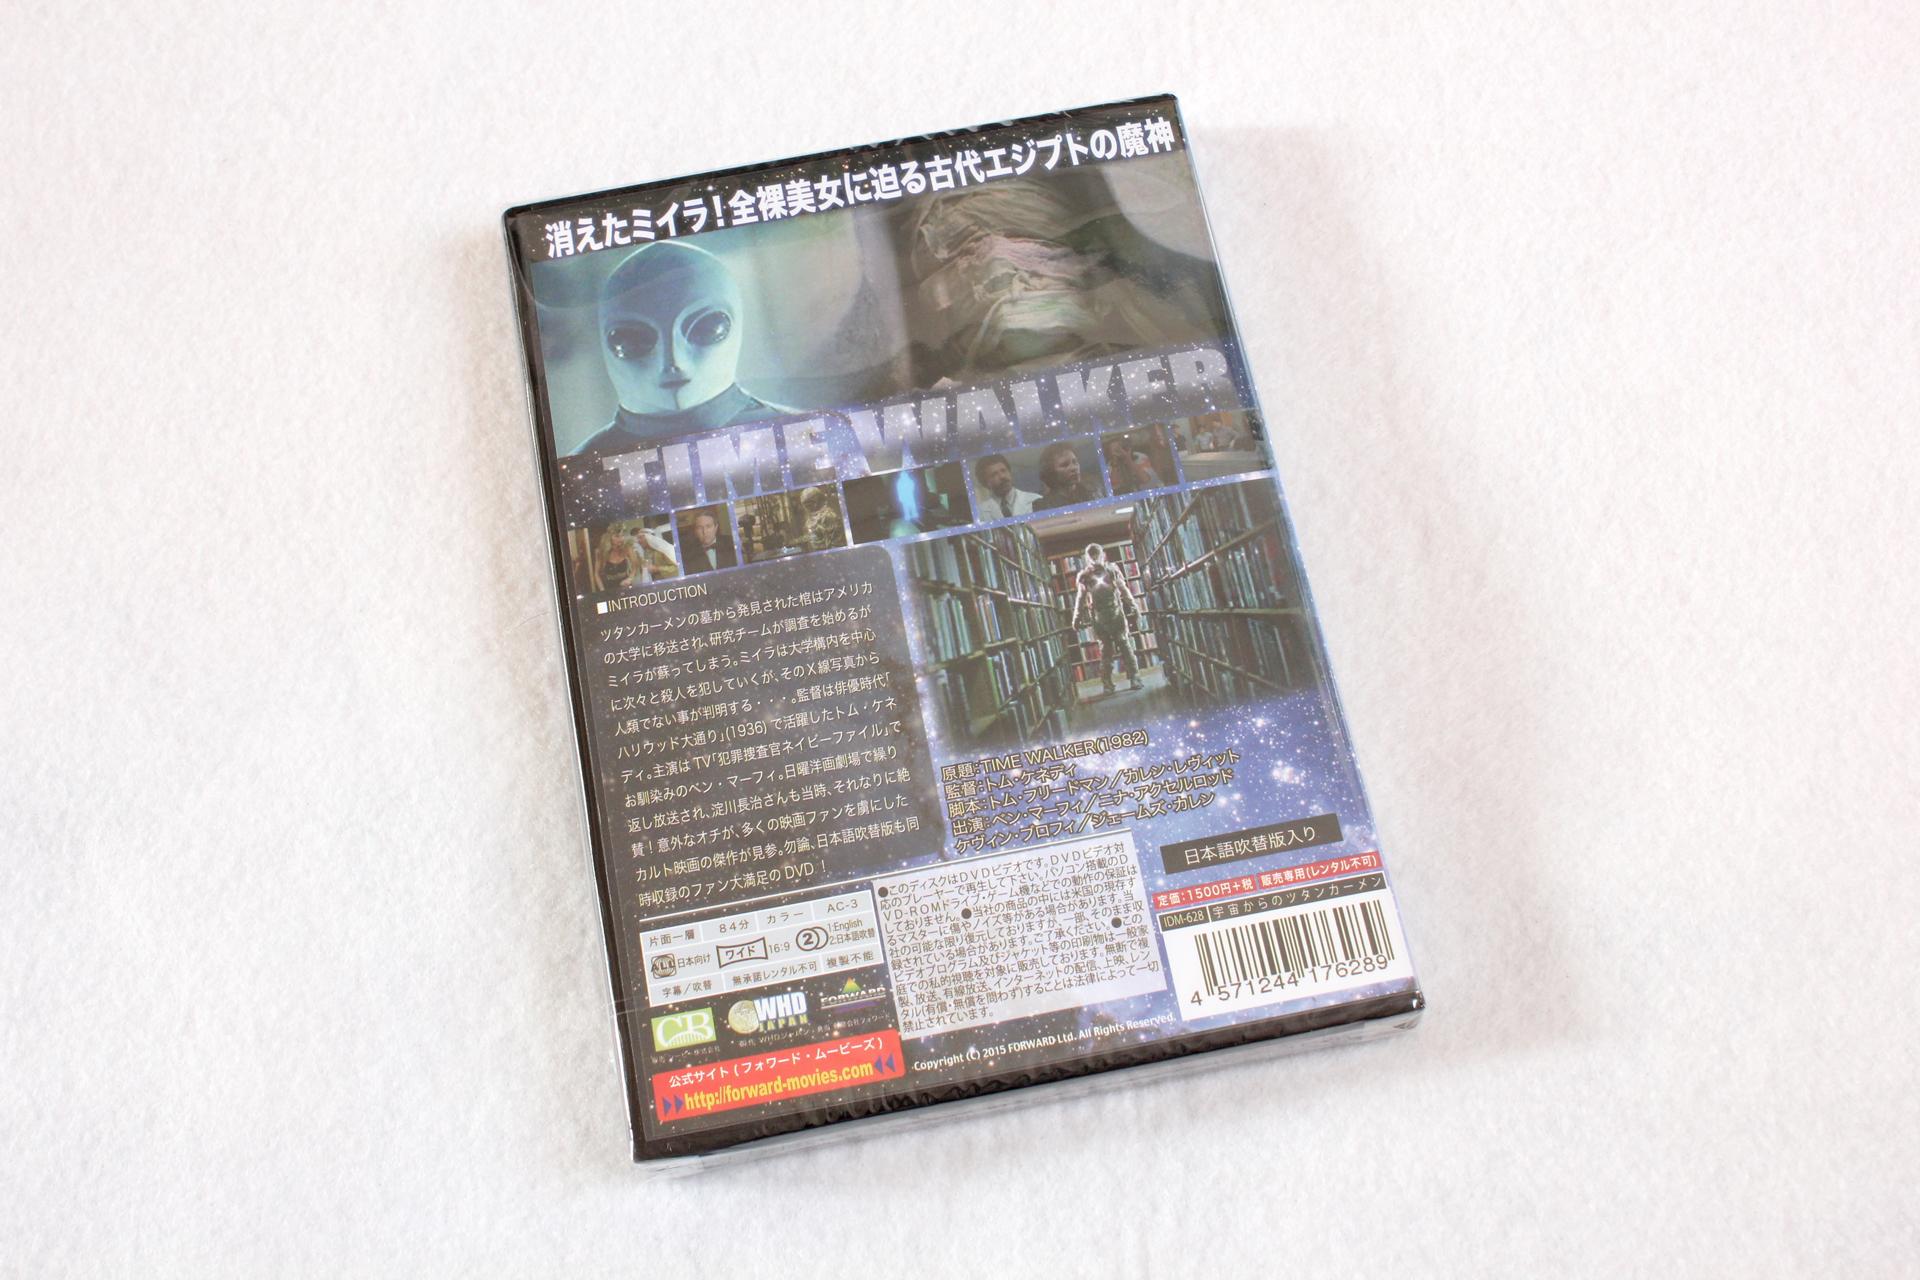 2015-10-24-TIME_WALKER_DVD-2.JPG